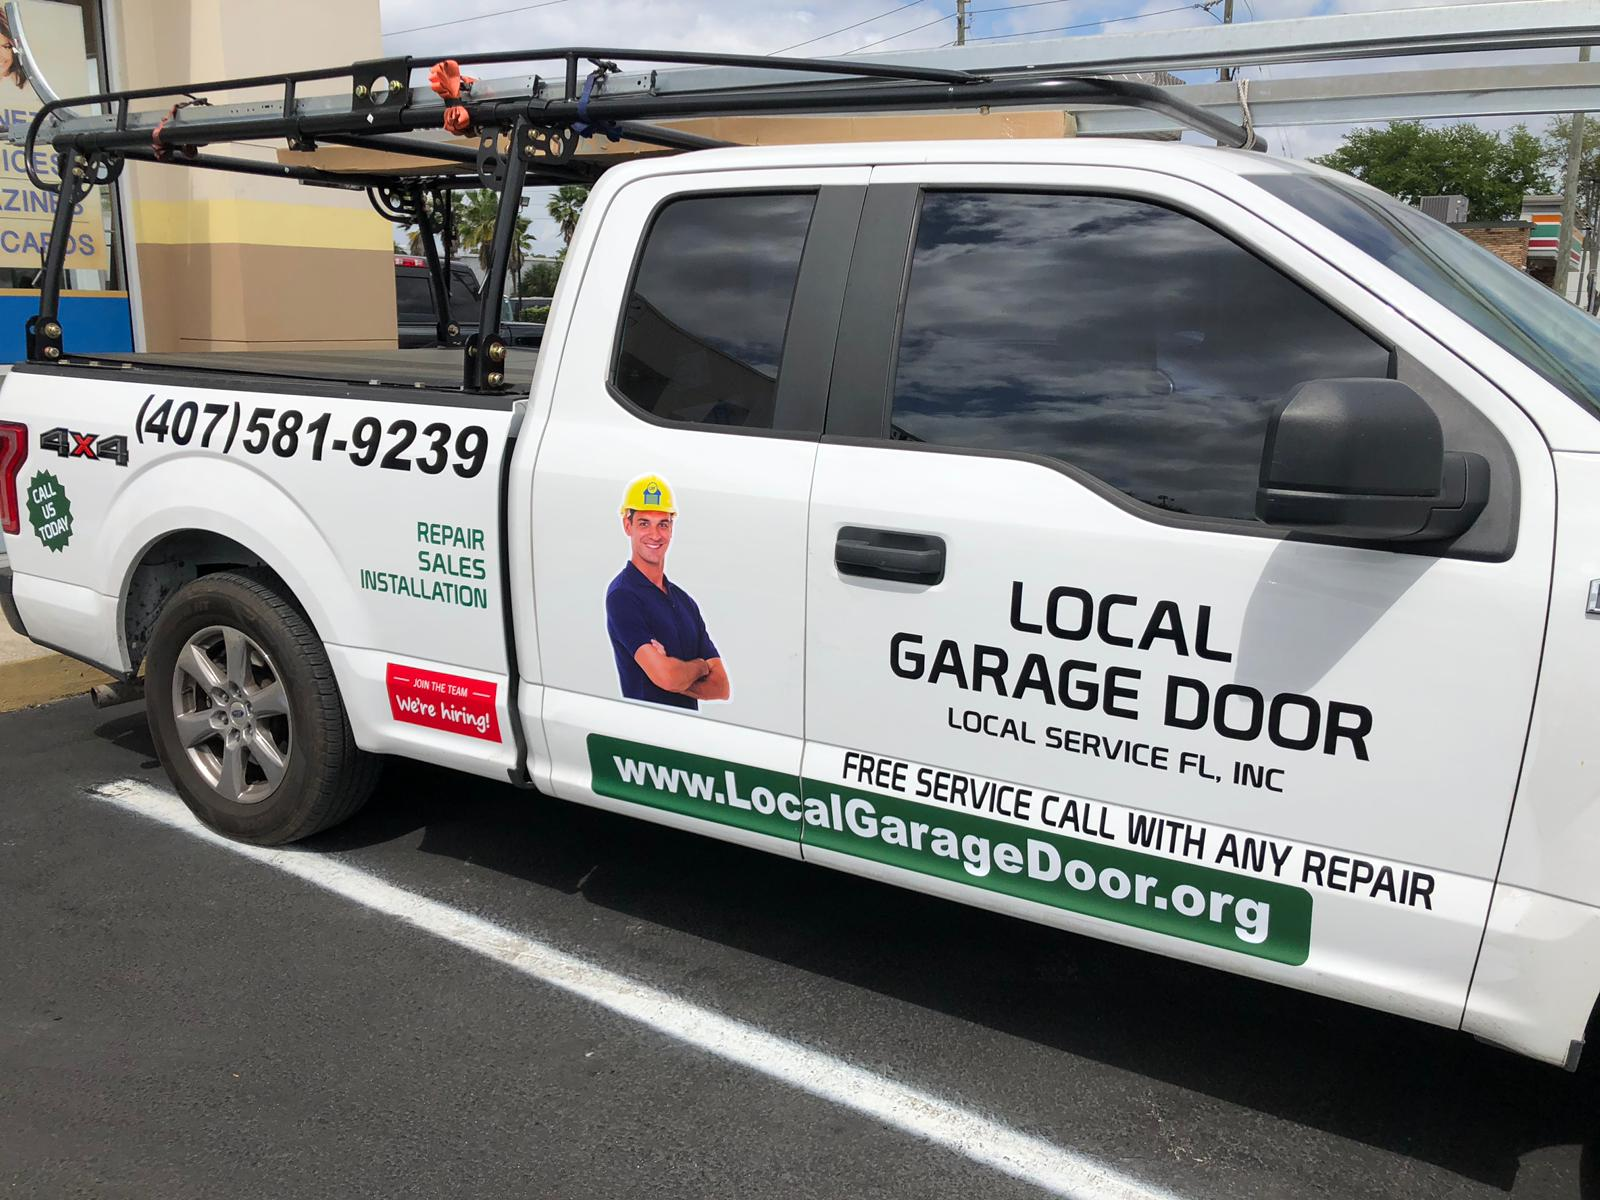 About Local Garage Door Free Service, Local Garage Door Services